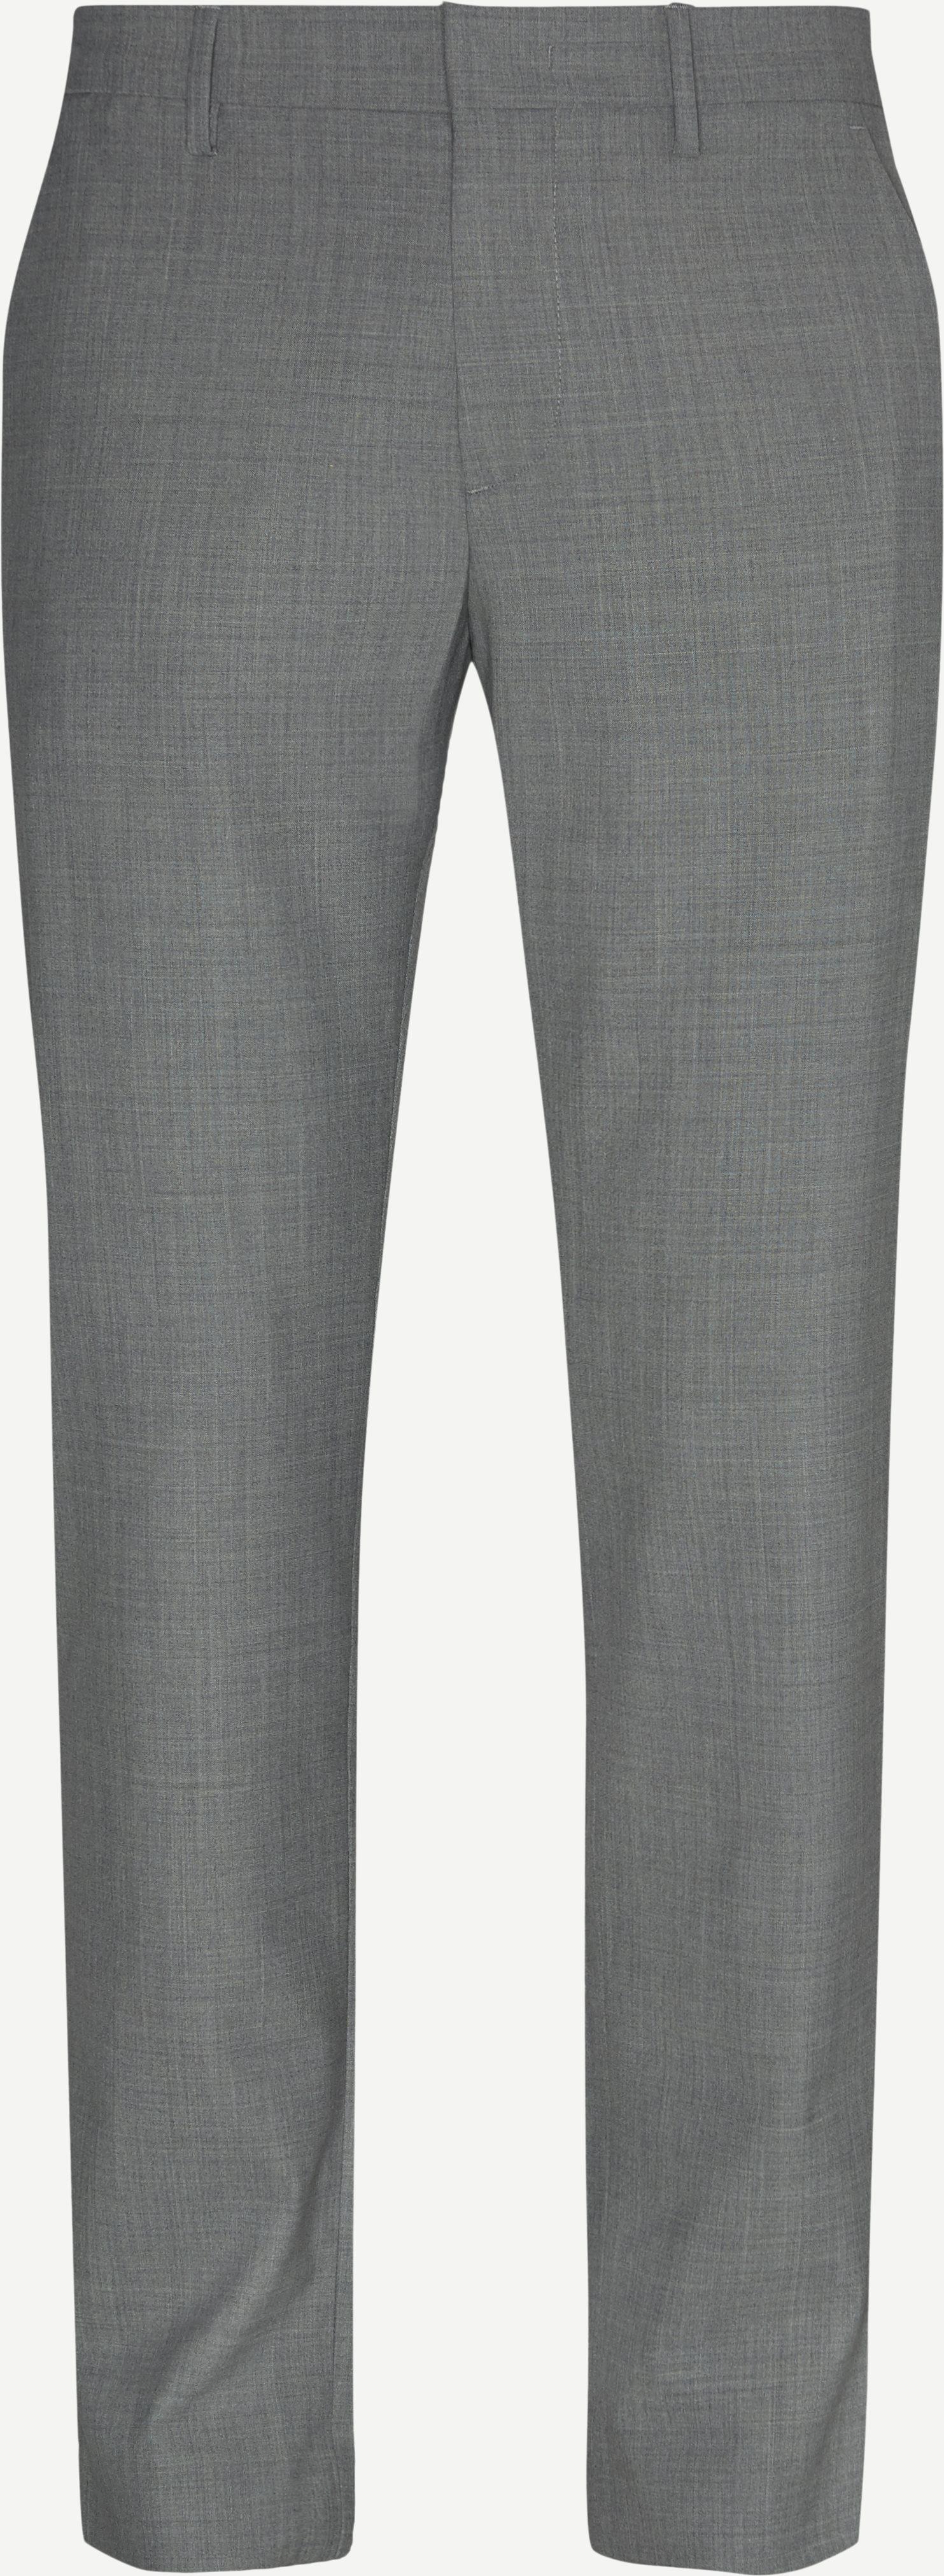 Hosen - Regular - Grau